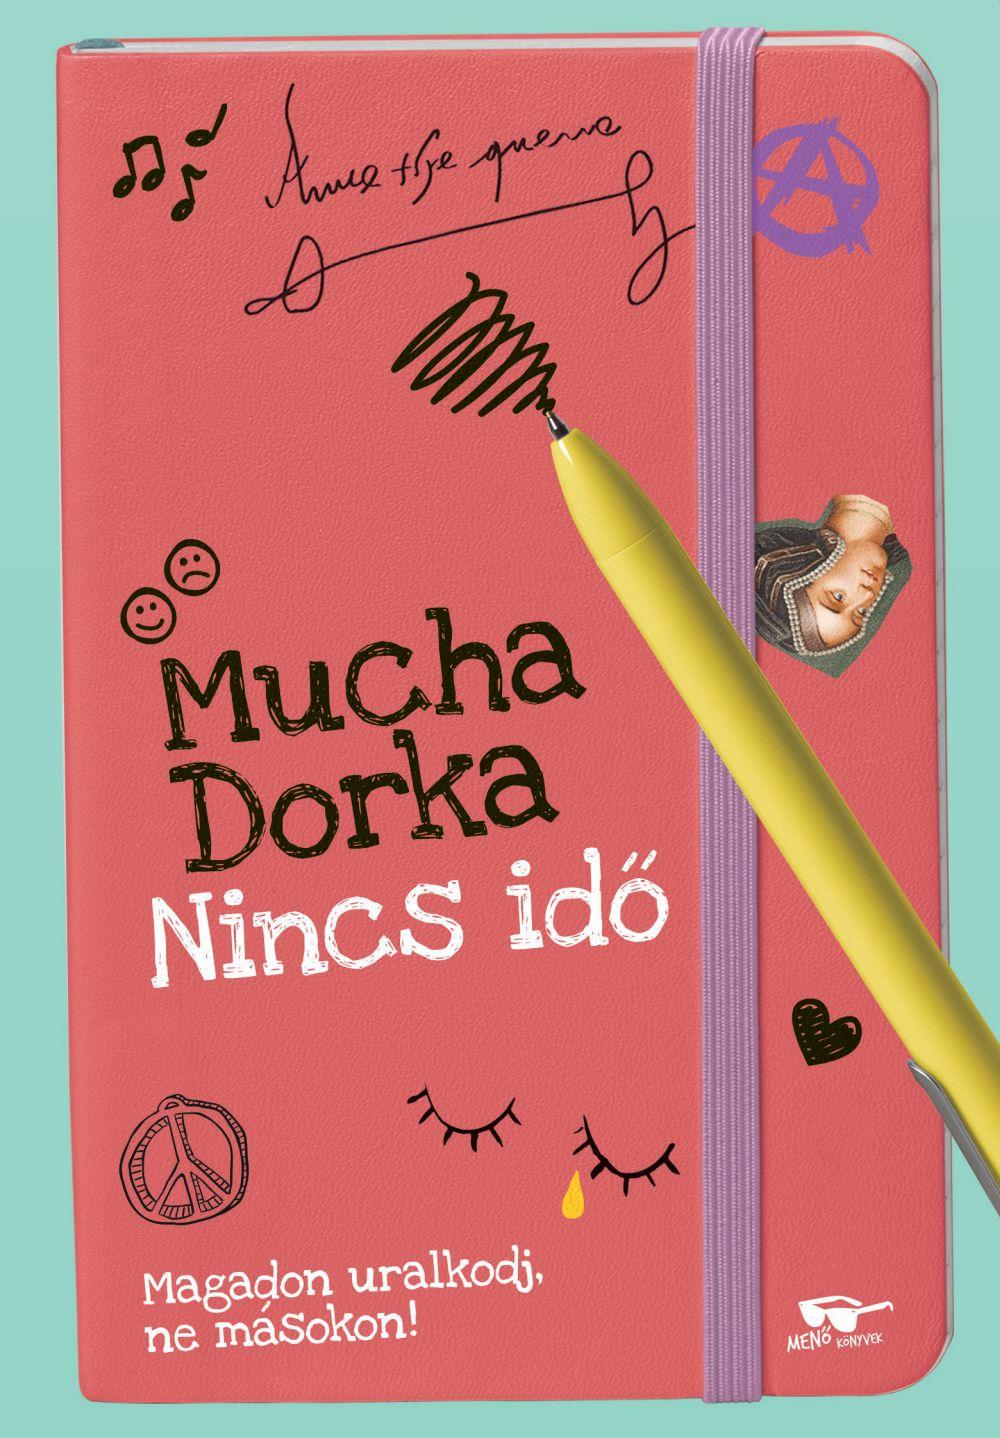 Mucha Dorka - Nincs idő